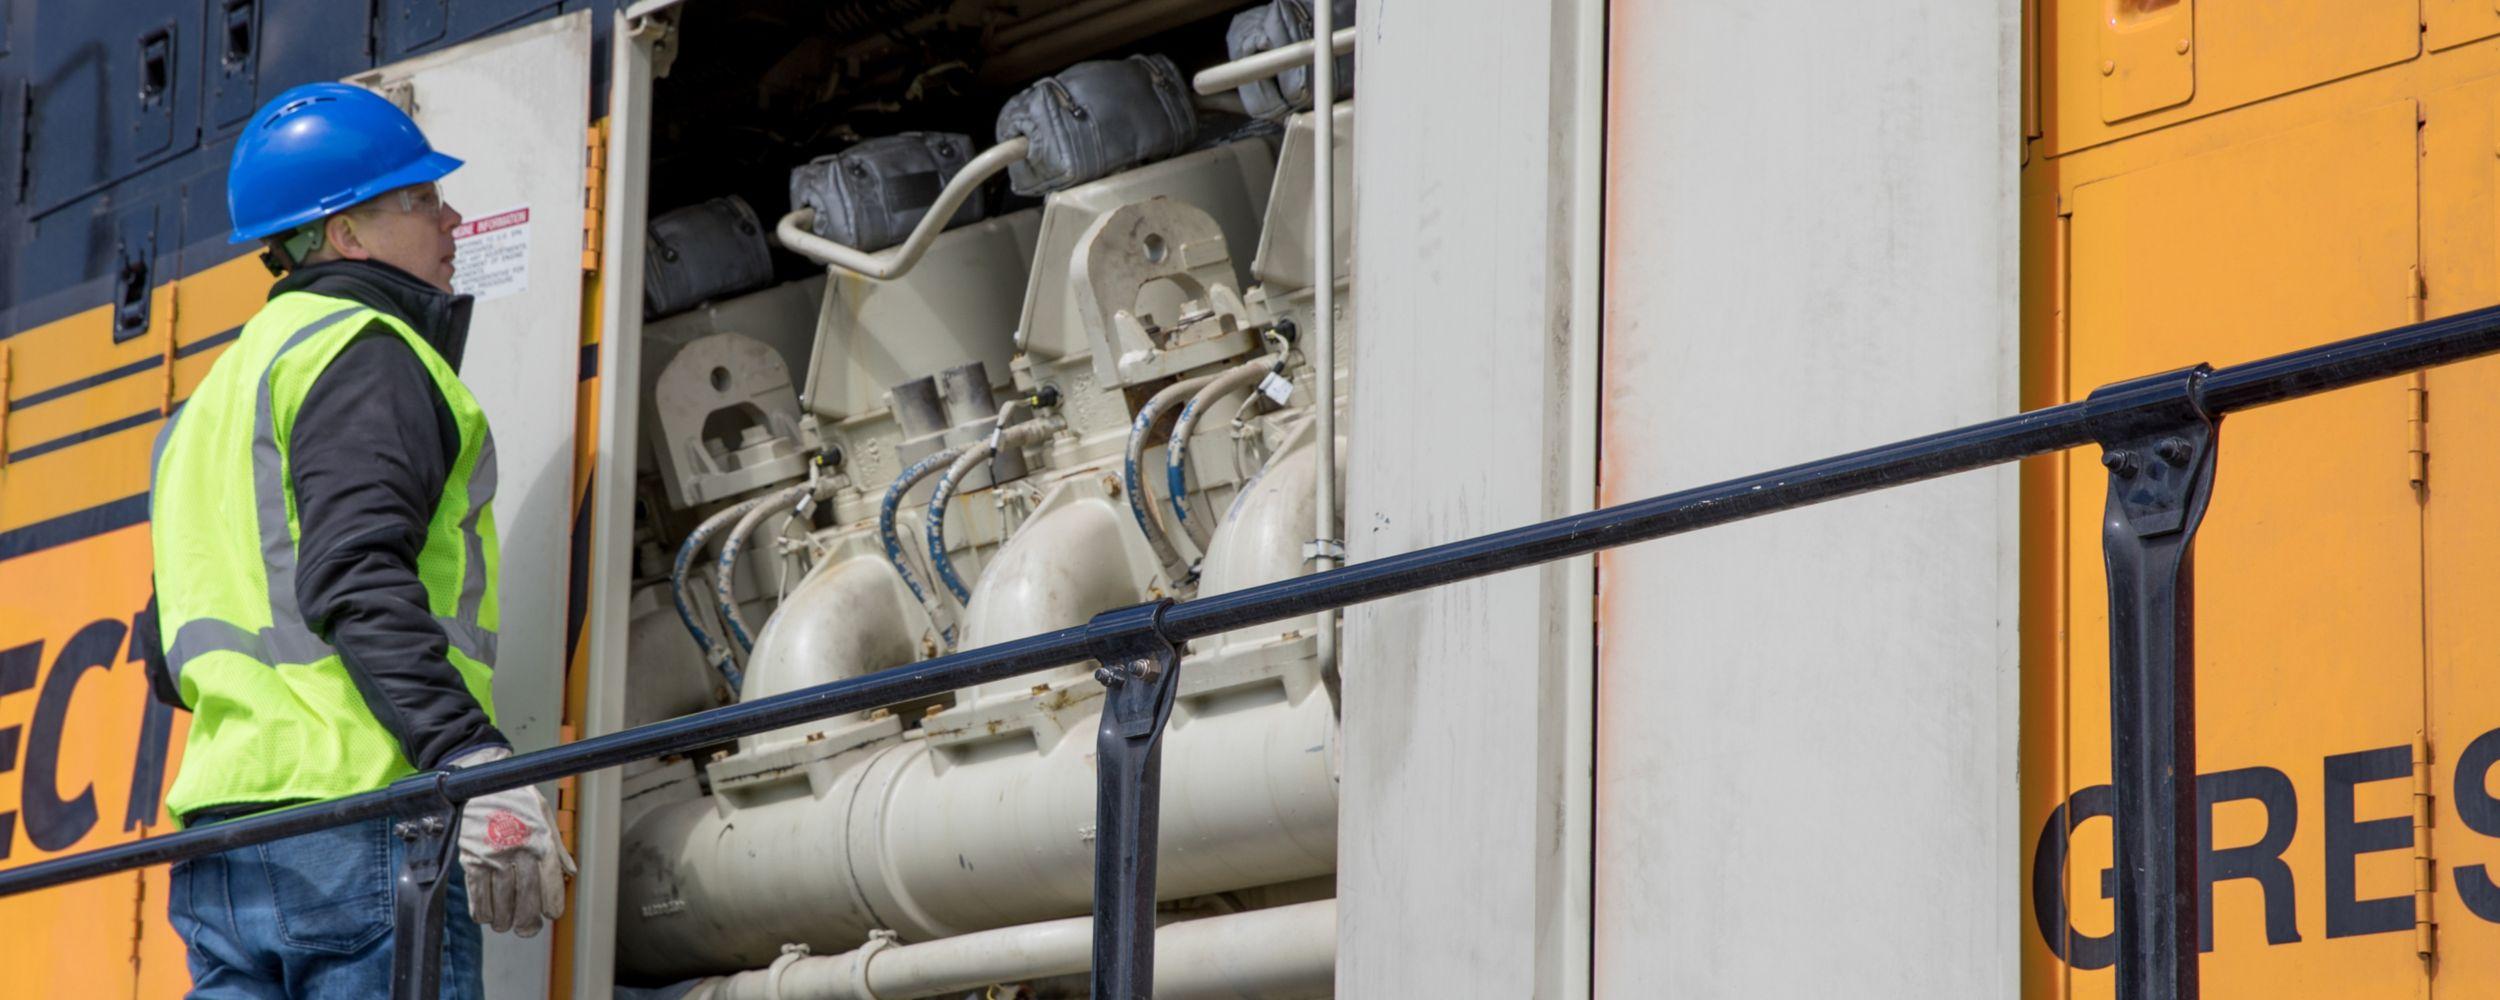 Locomotive Services - leasing, maintenance, customer performance, remanufacturing, engine overhauls